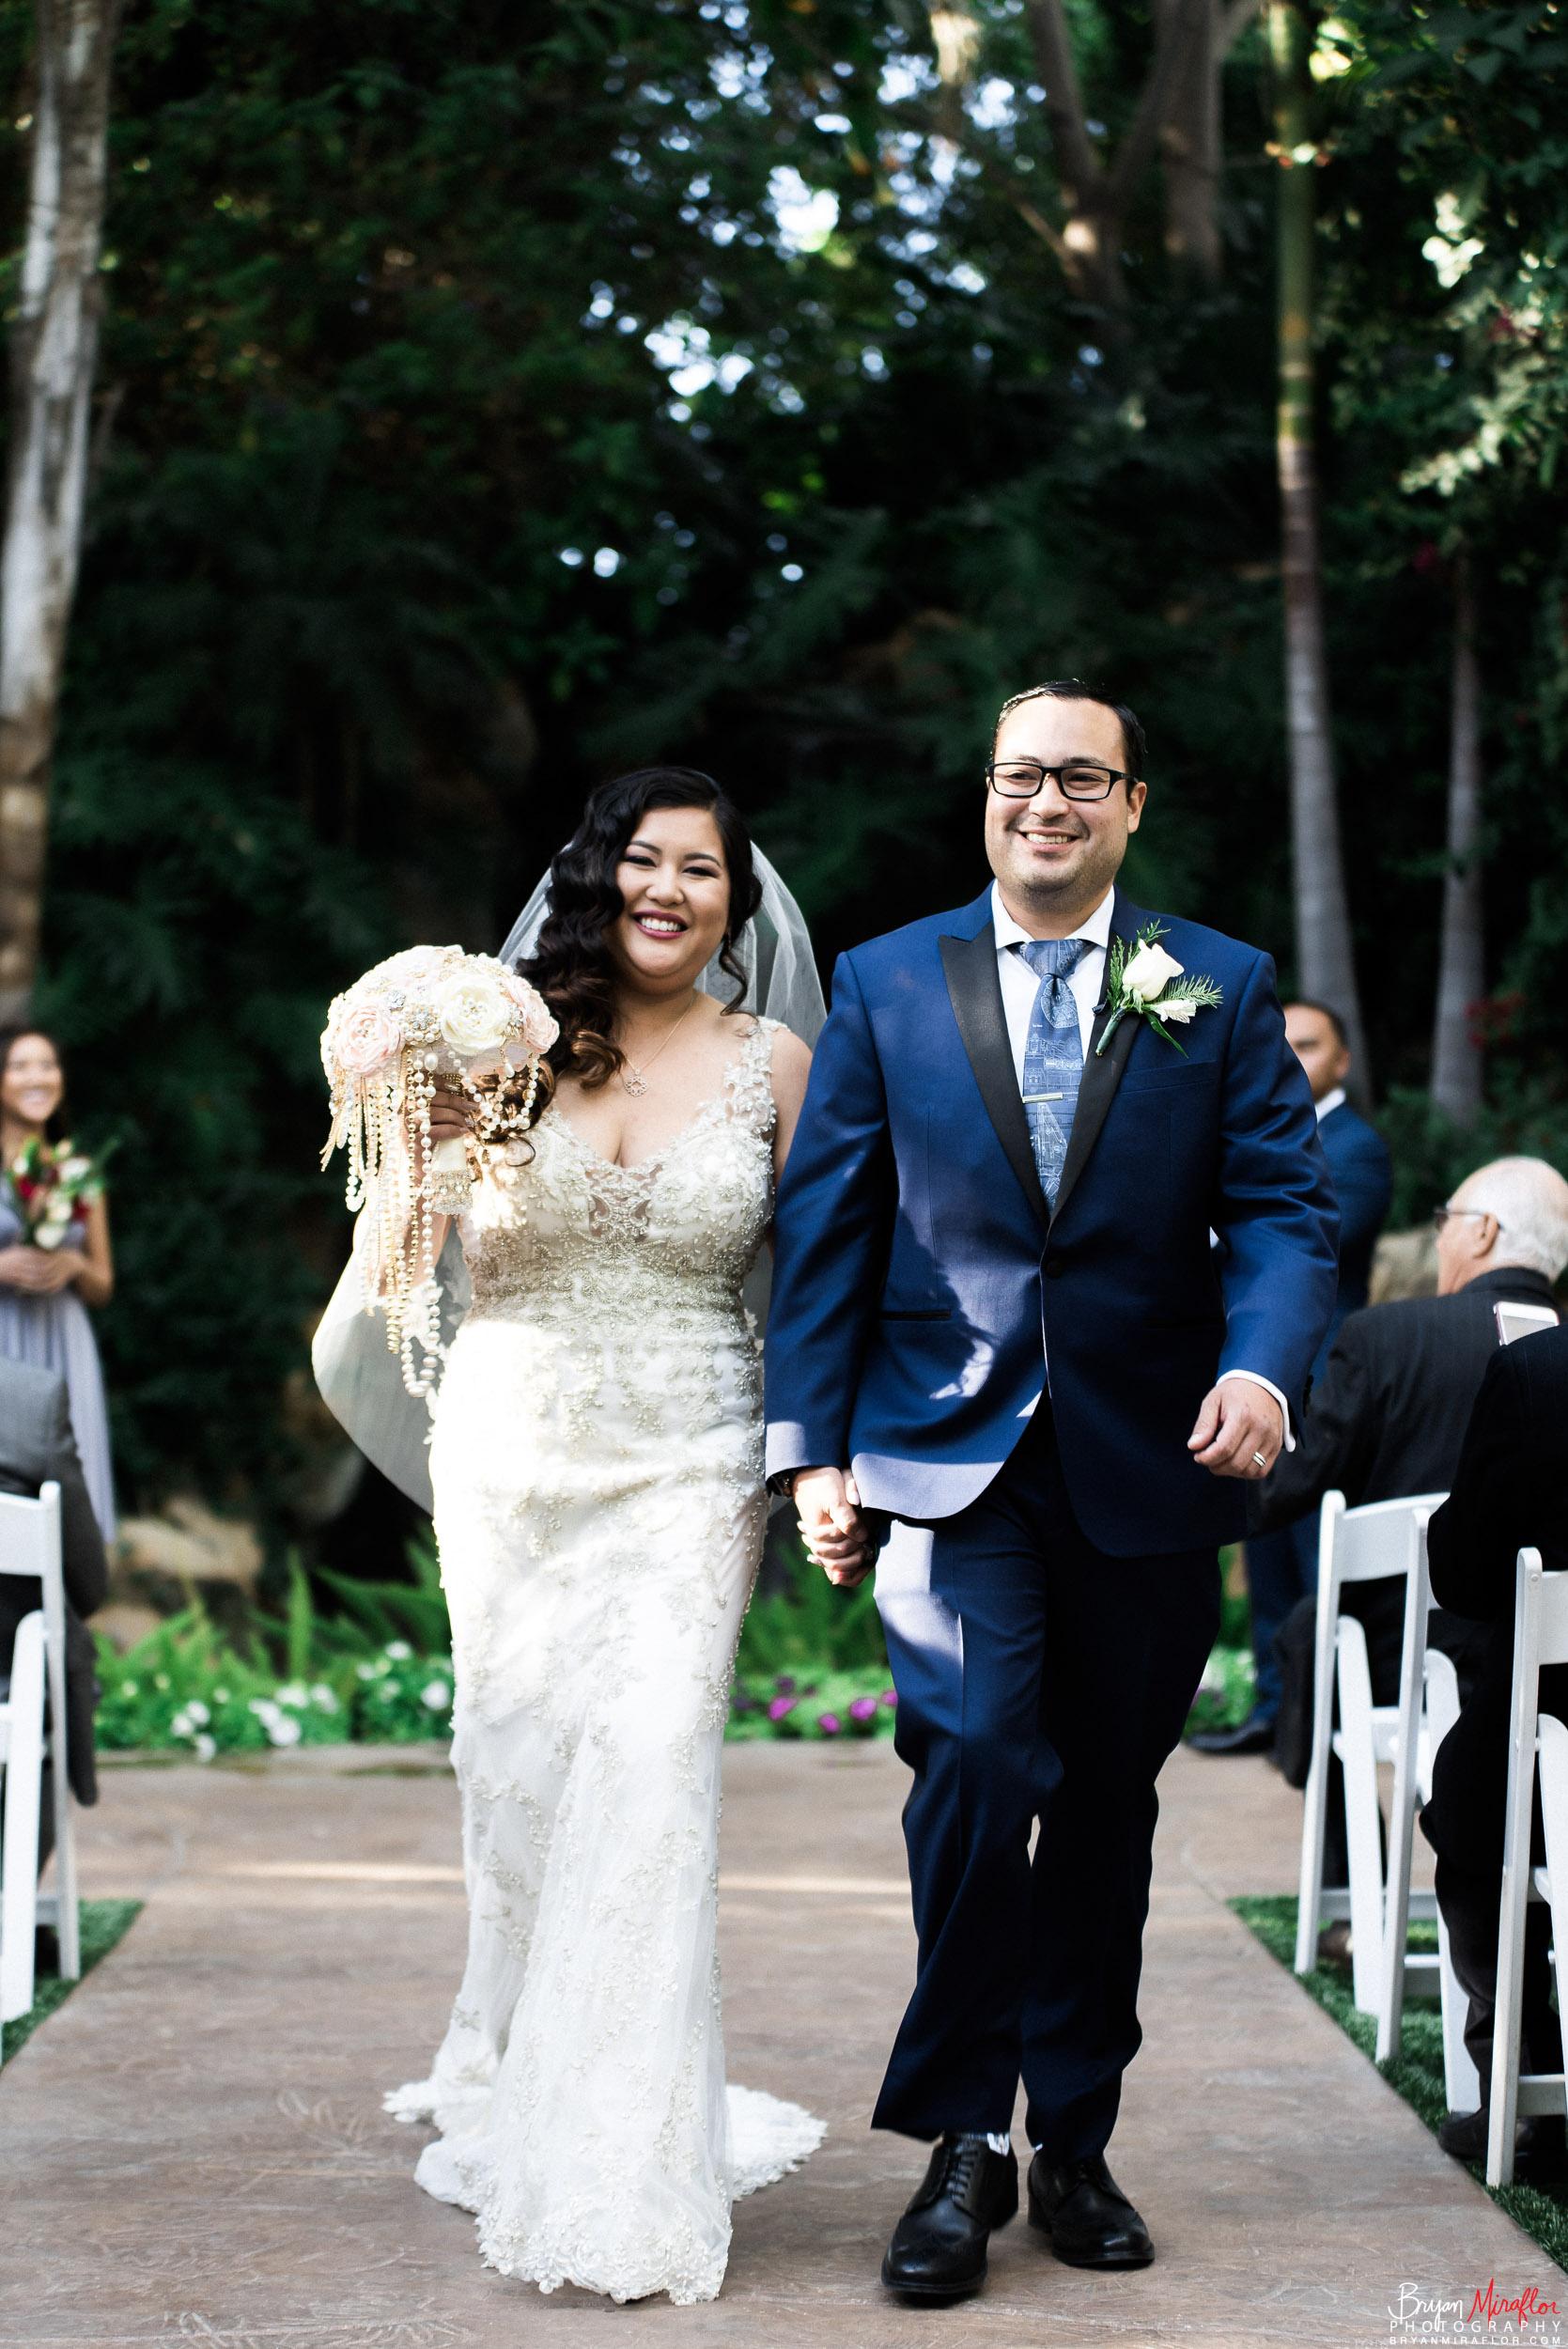 Bryan-Miraflor-Photography-Hannah-Jonathan-Married-Grand-Traditions-Estate-Gardens-Fallbrook-20171222-110.jpg